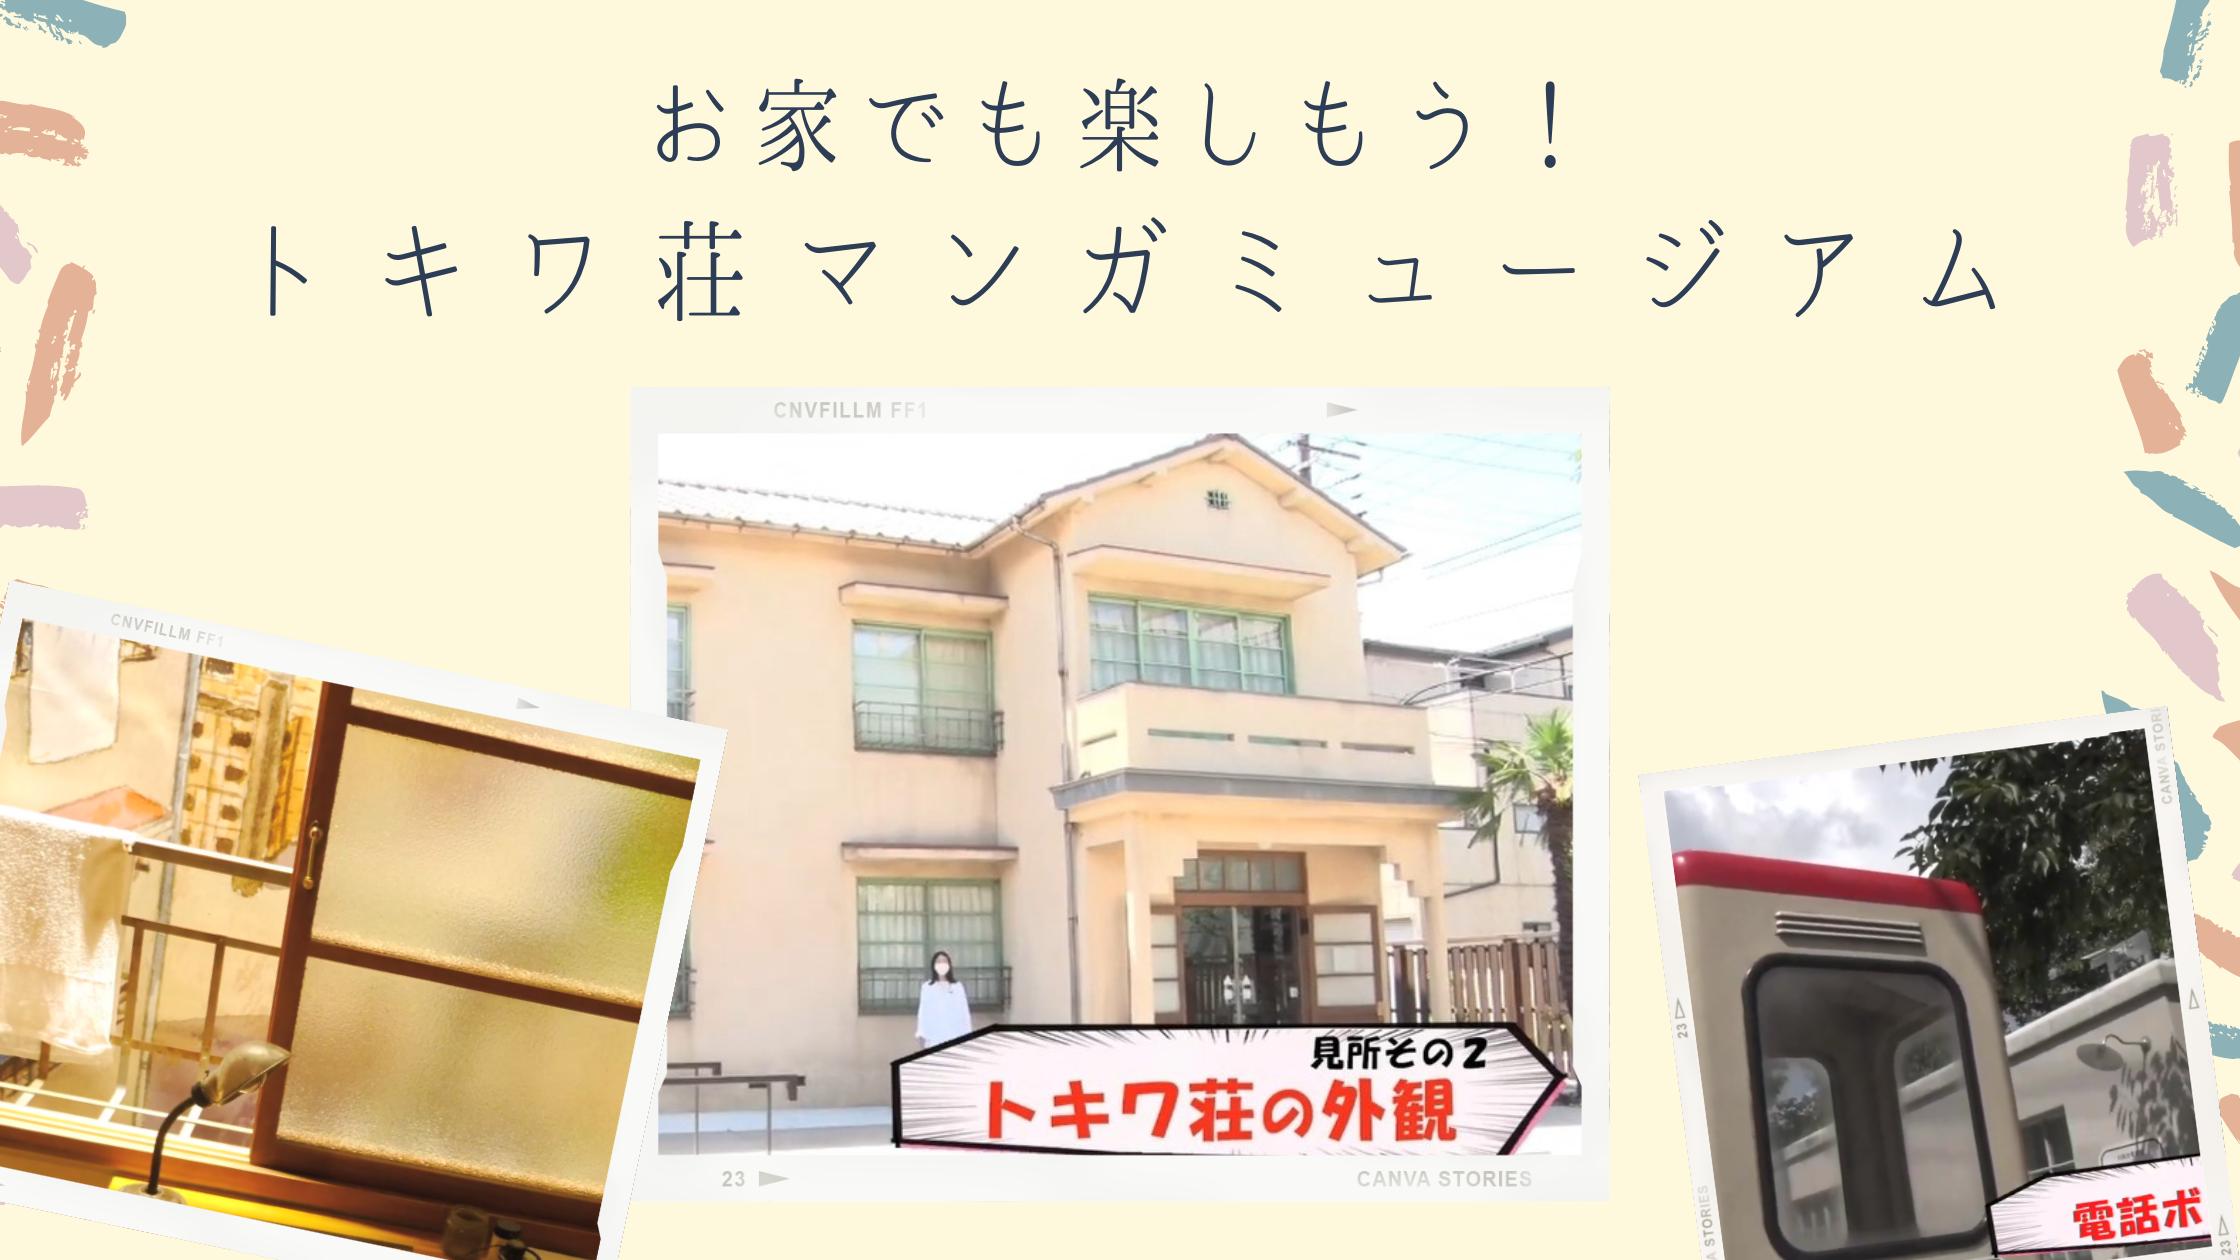 note ノート 記事見出し画像 アイキャッチ (12).png